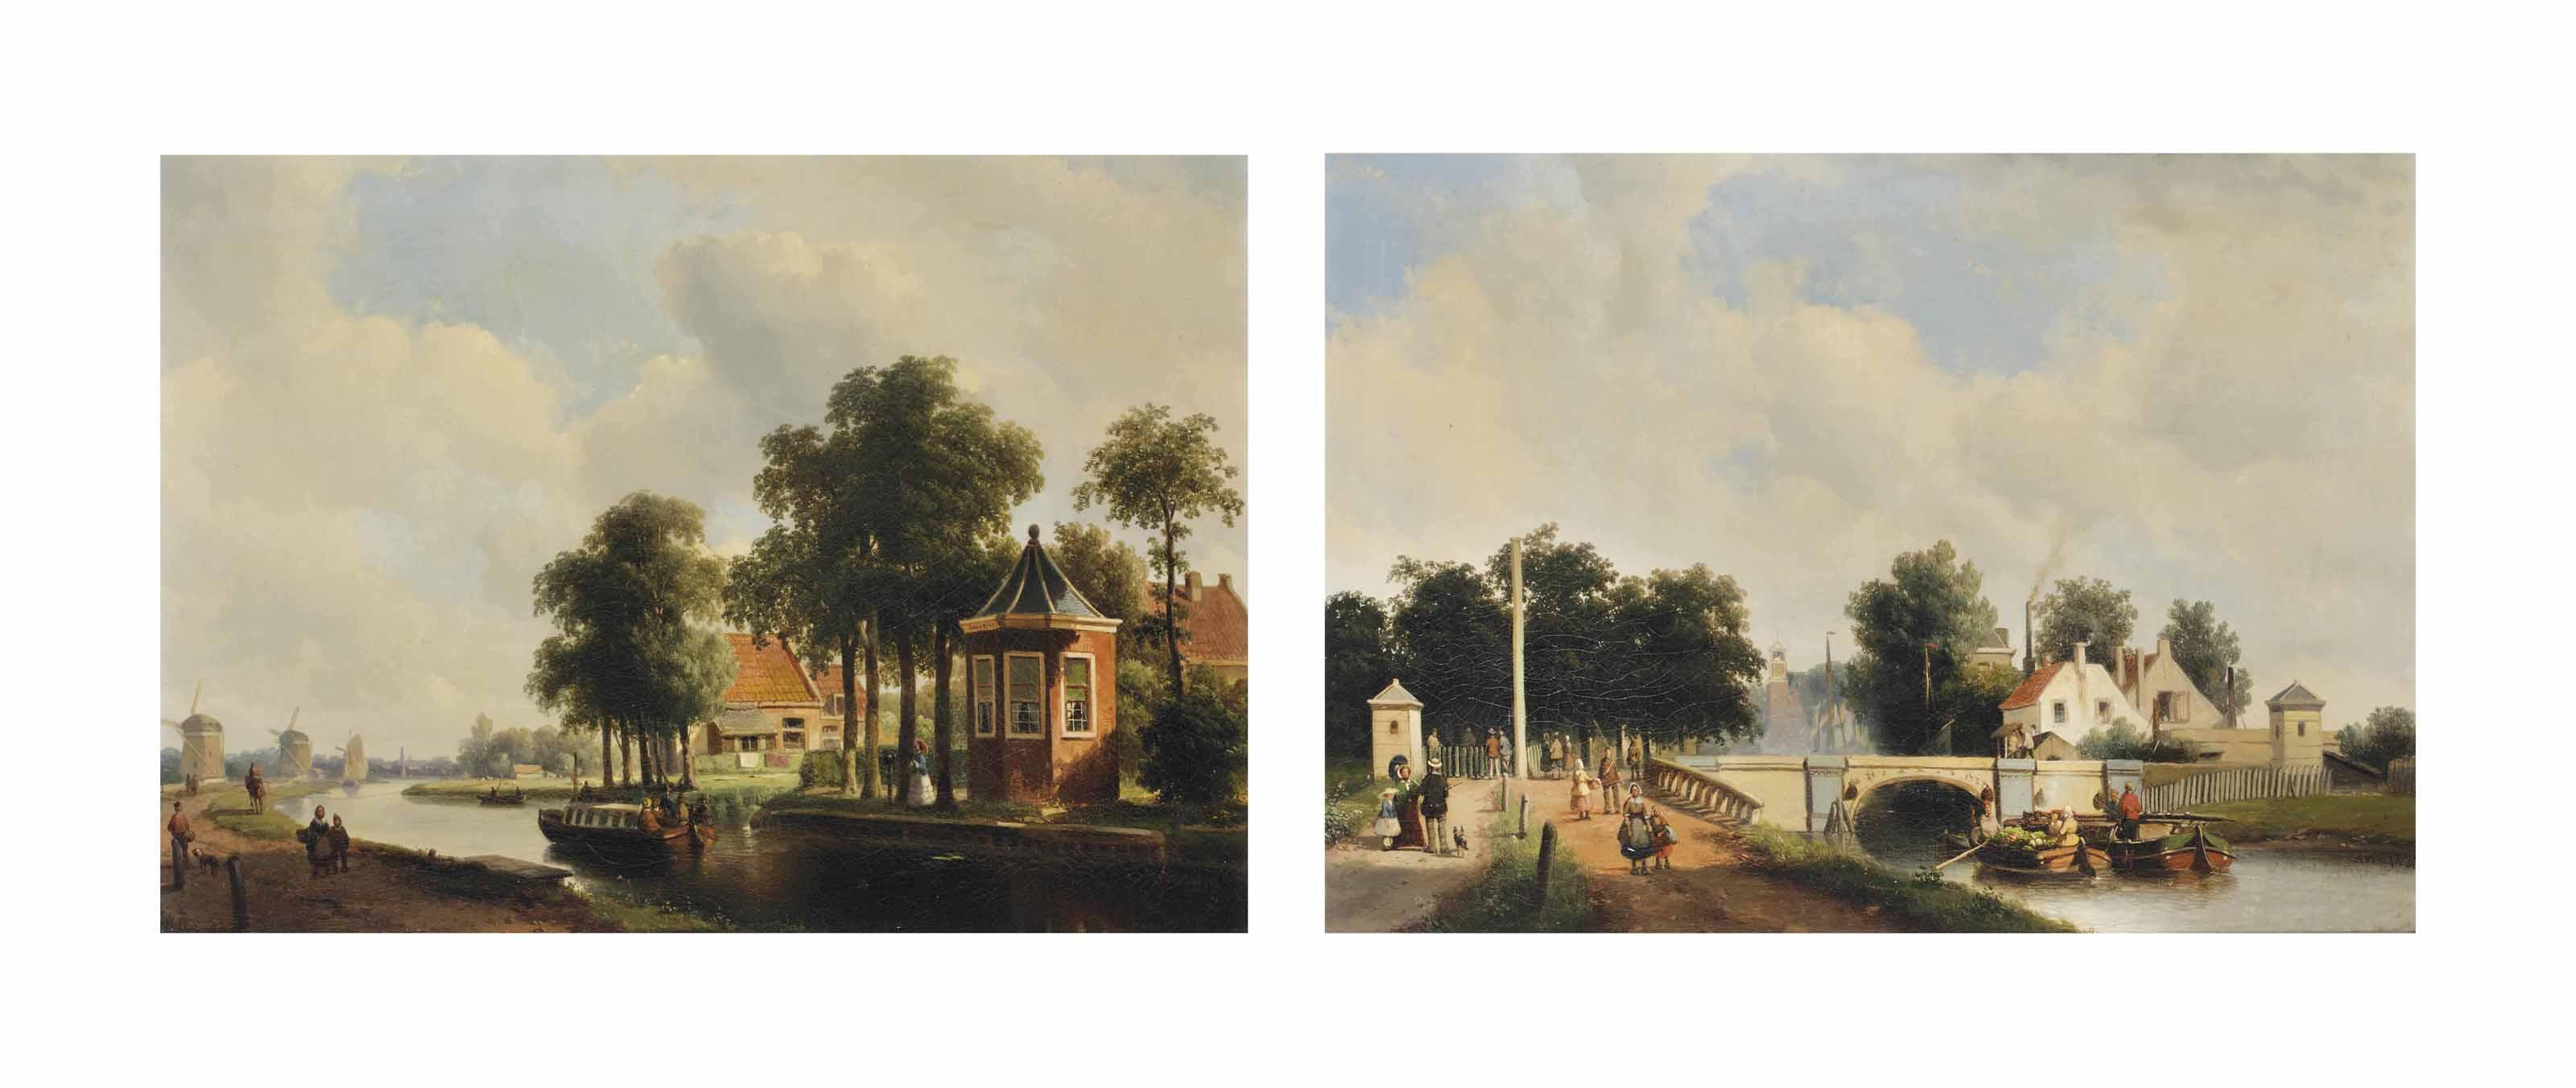 A summer's day on the Trekvliet seen from Haagzigt, Voorburg; and The Trekweg along the Trekvliet with the old railway bridge, The Hague